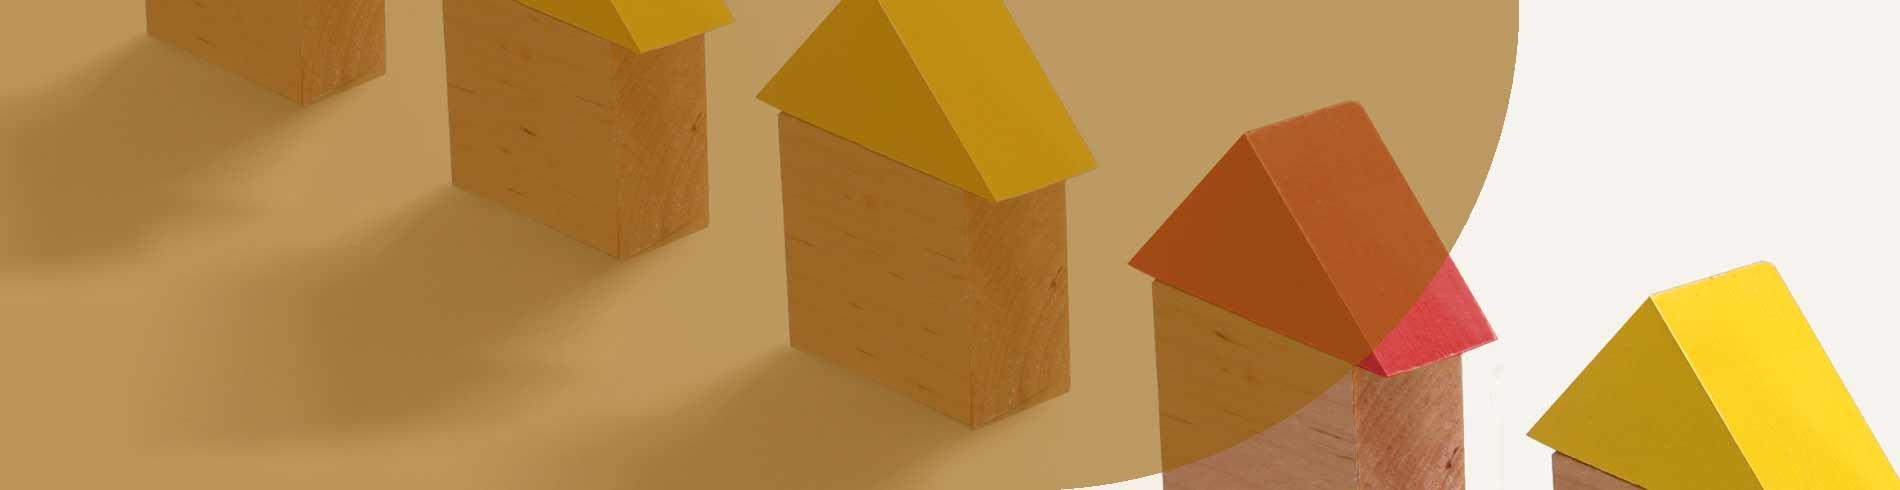 bizi asegurua hipoteka